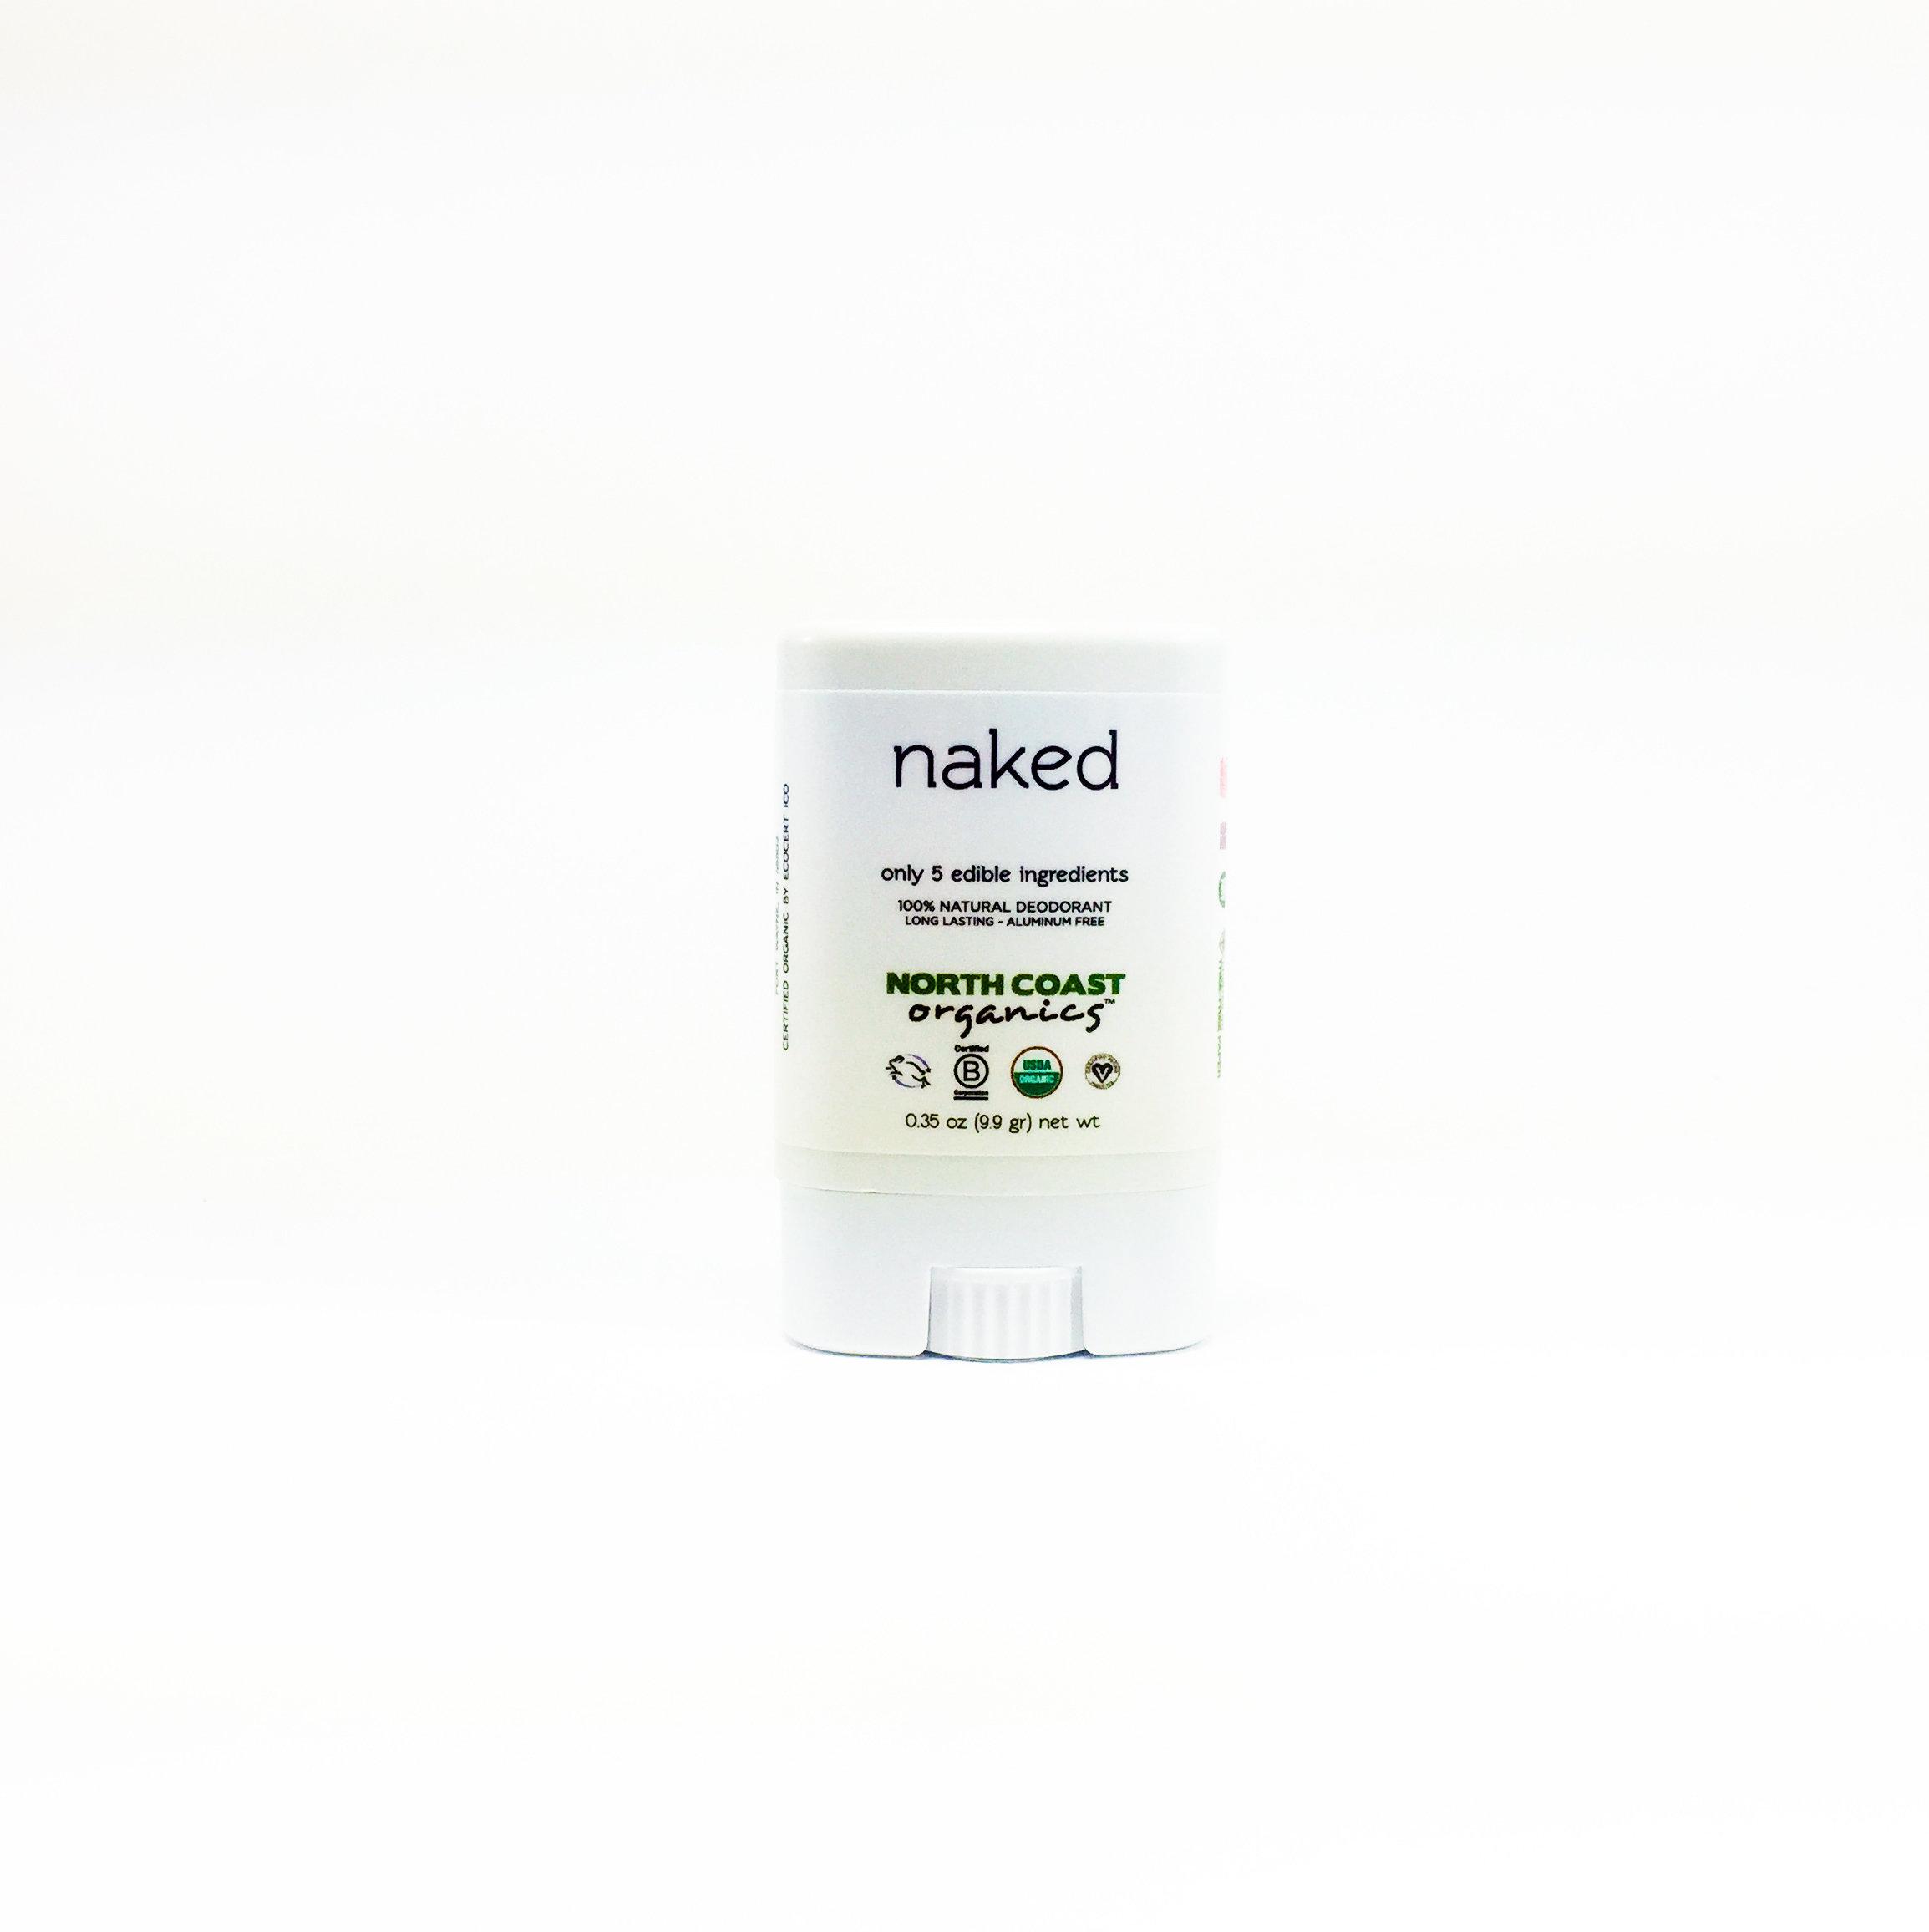 naked Organic Deodorant